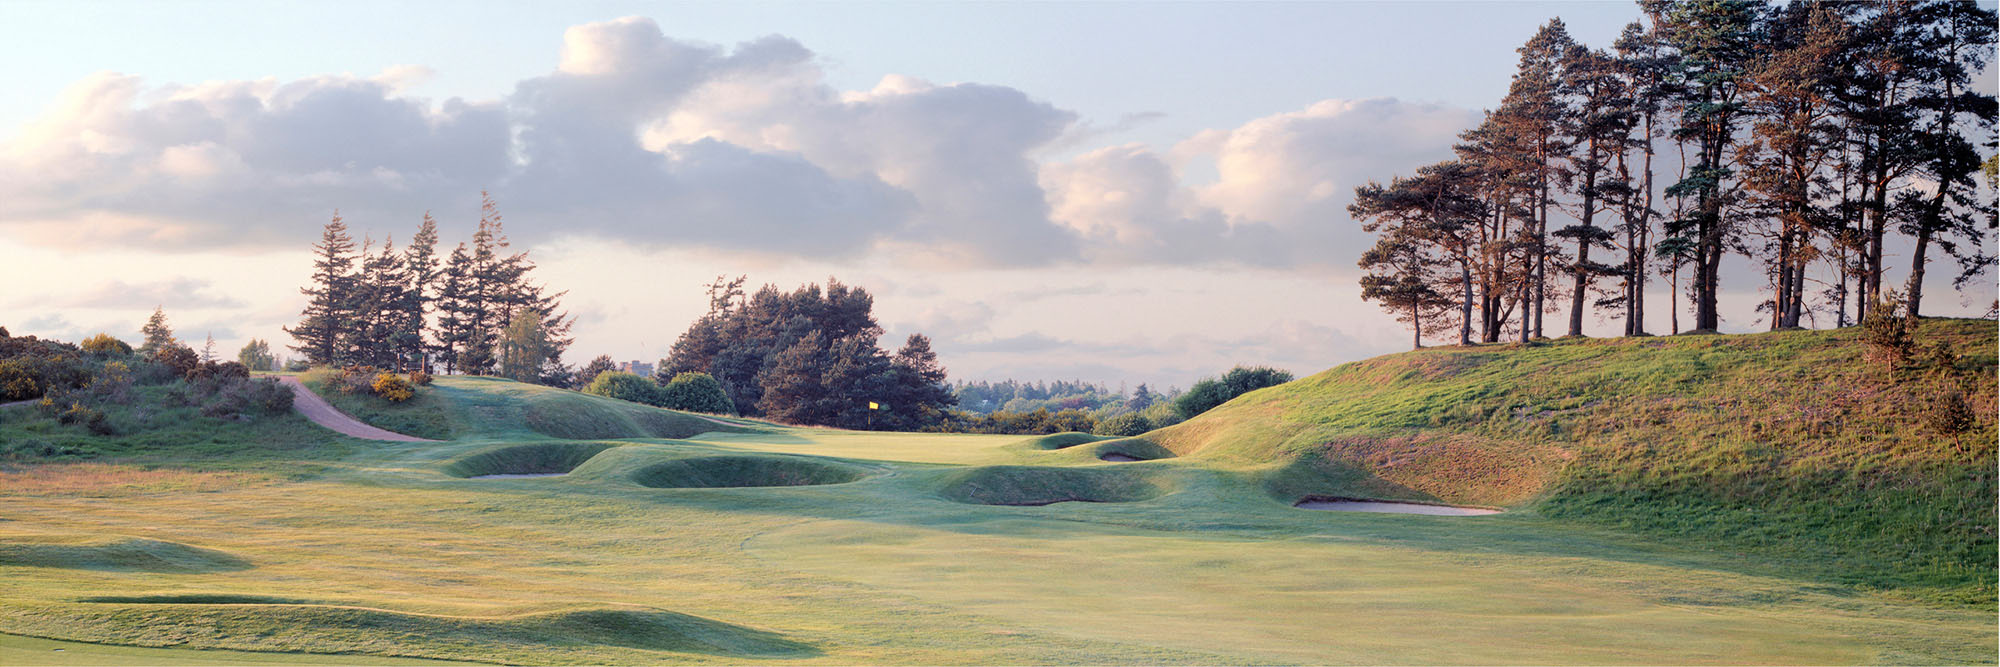 Golf Course Image - Gleneagles PGA Centenary Course No. 16